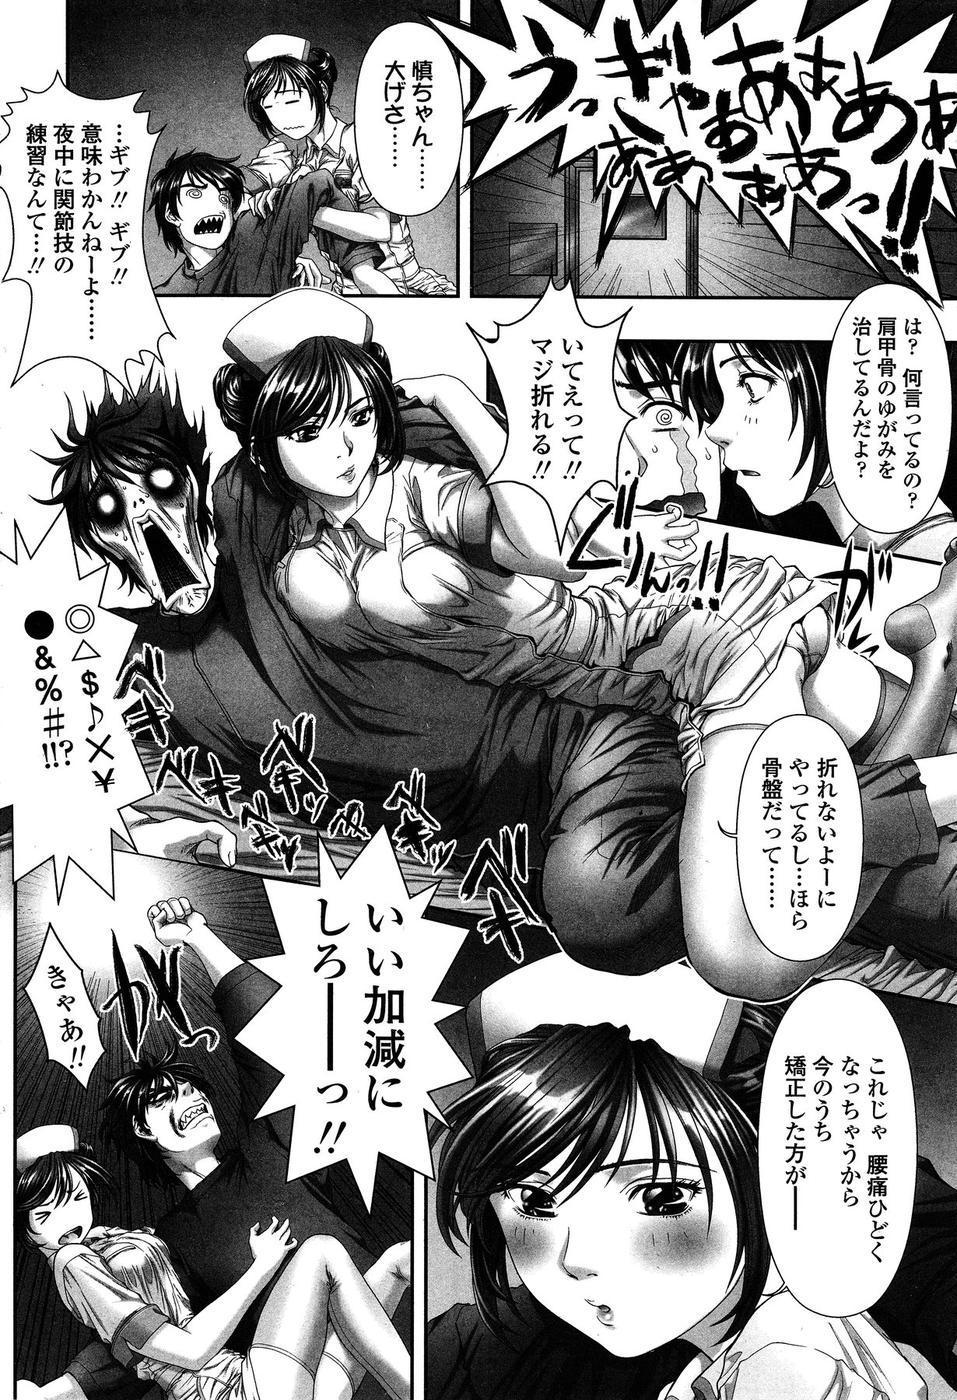 COMIC SIGMA 2009-01 Vol.28 26